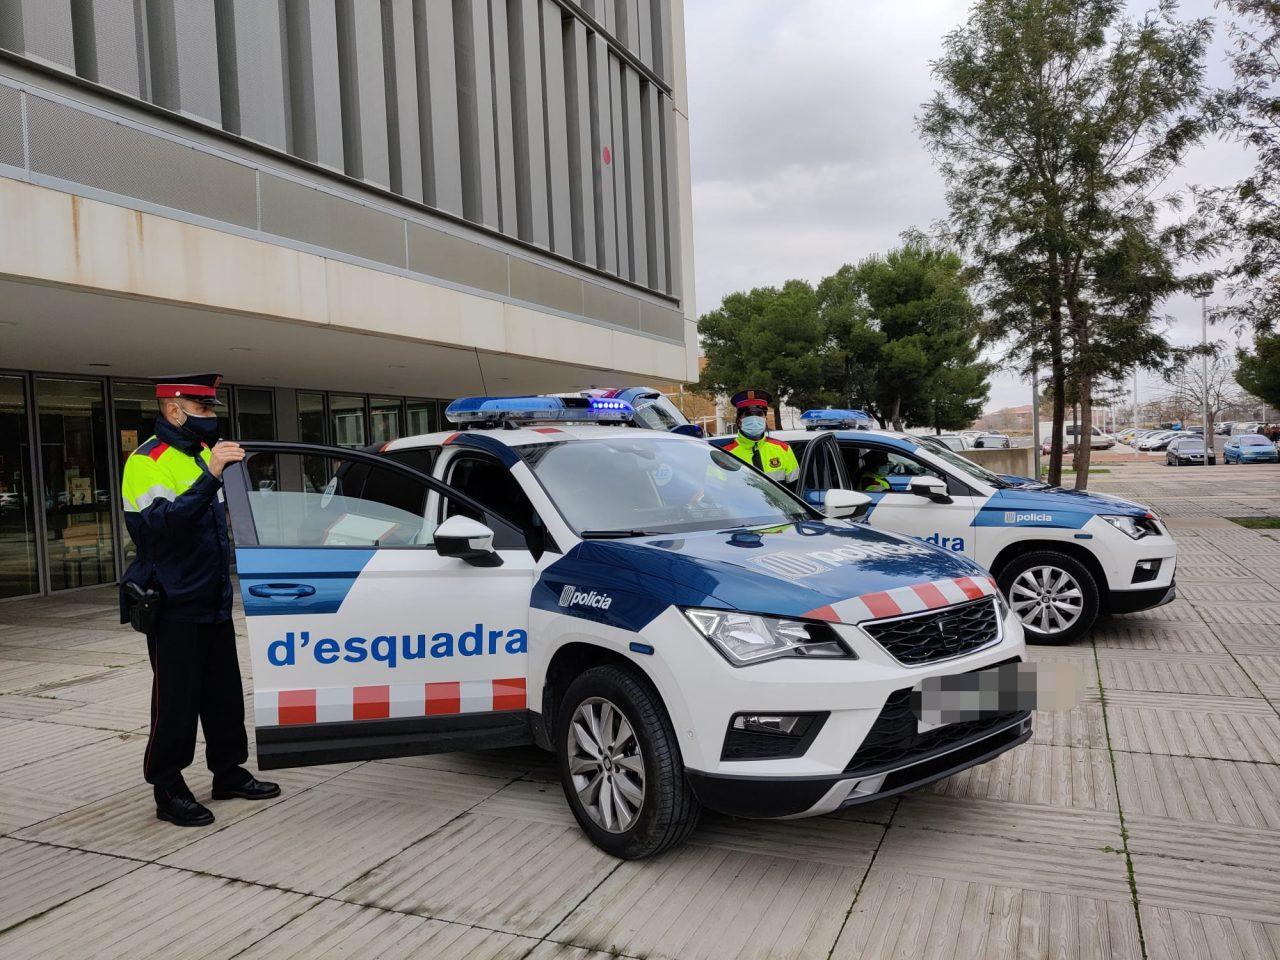 Flota-mossos-1280x960.jpg